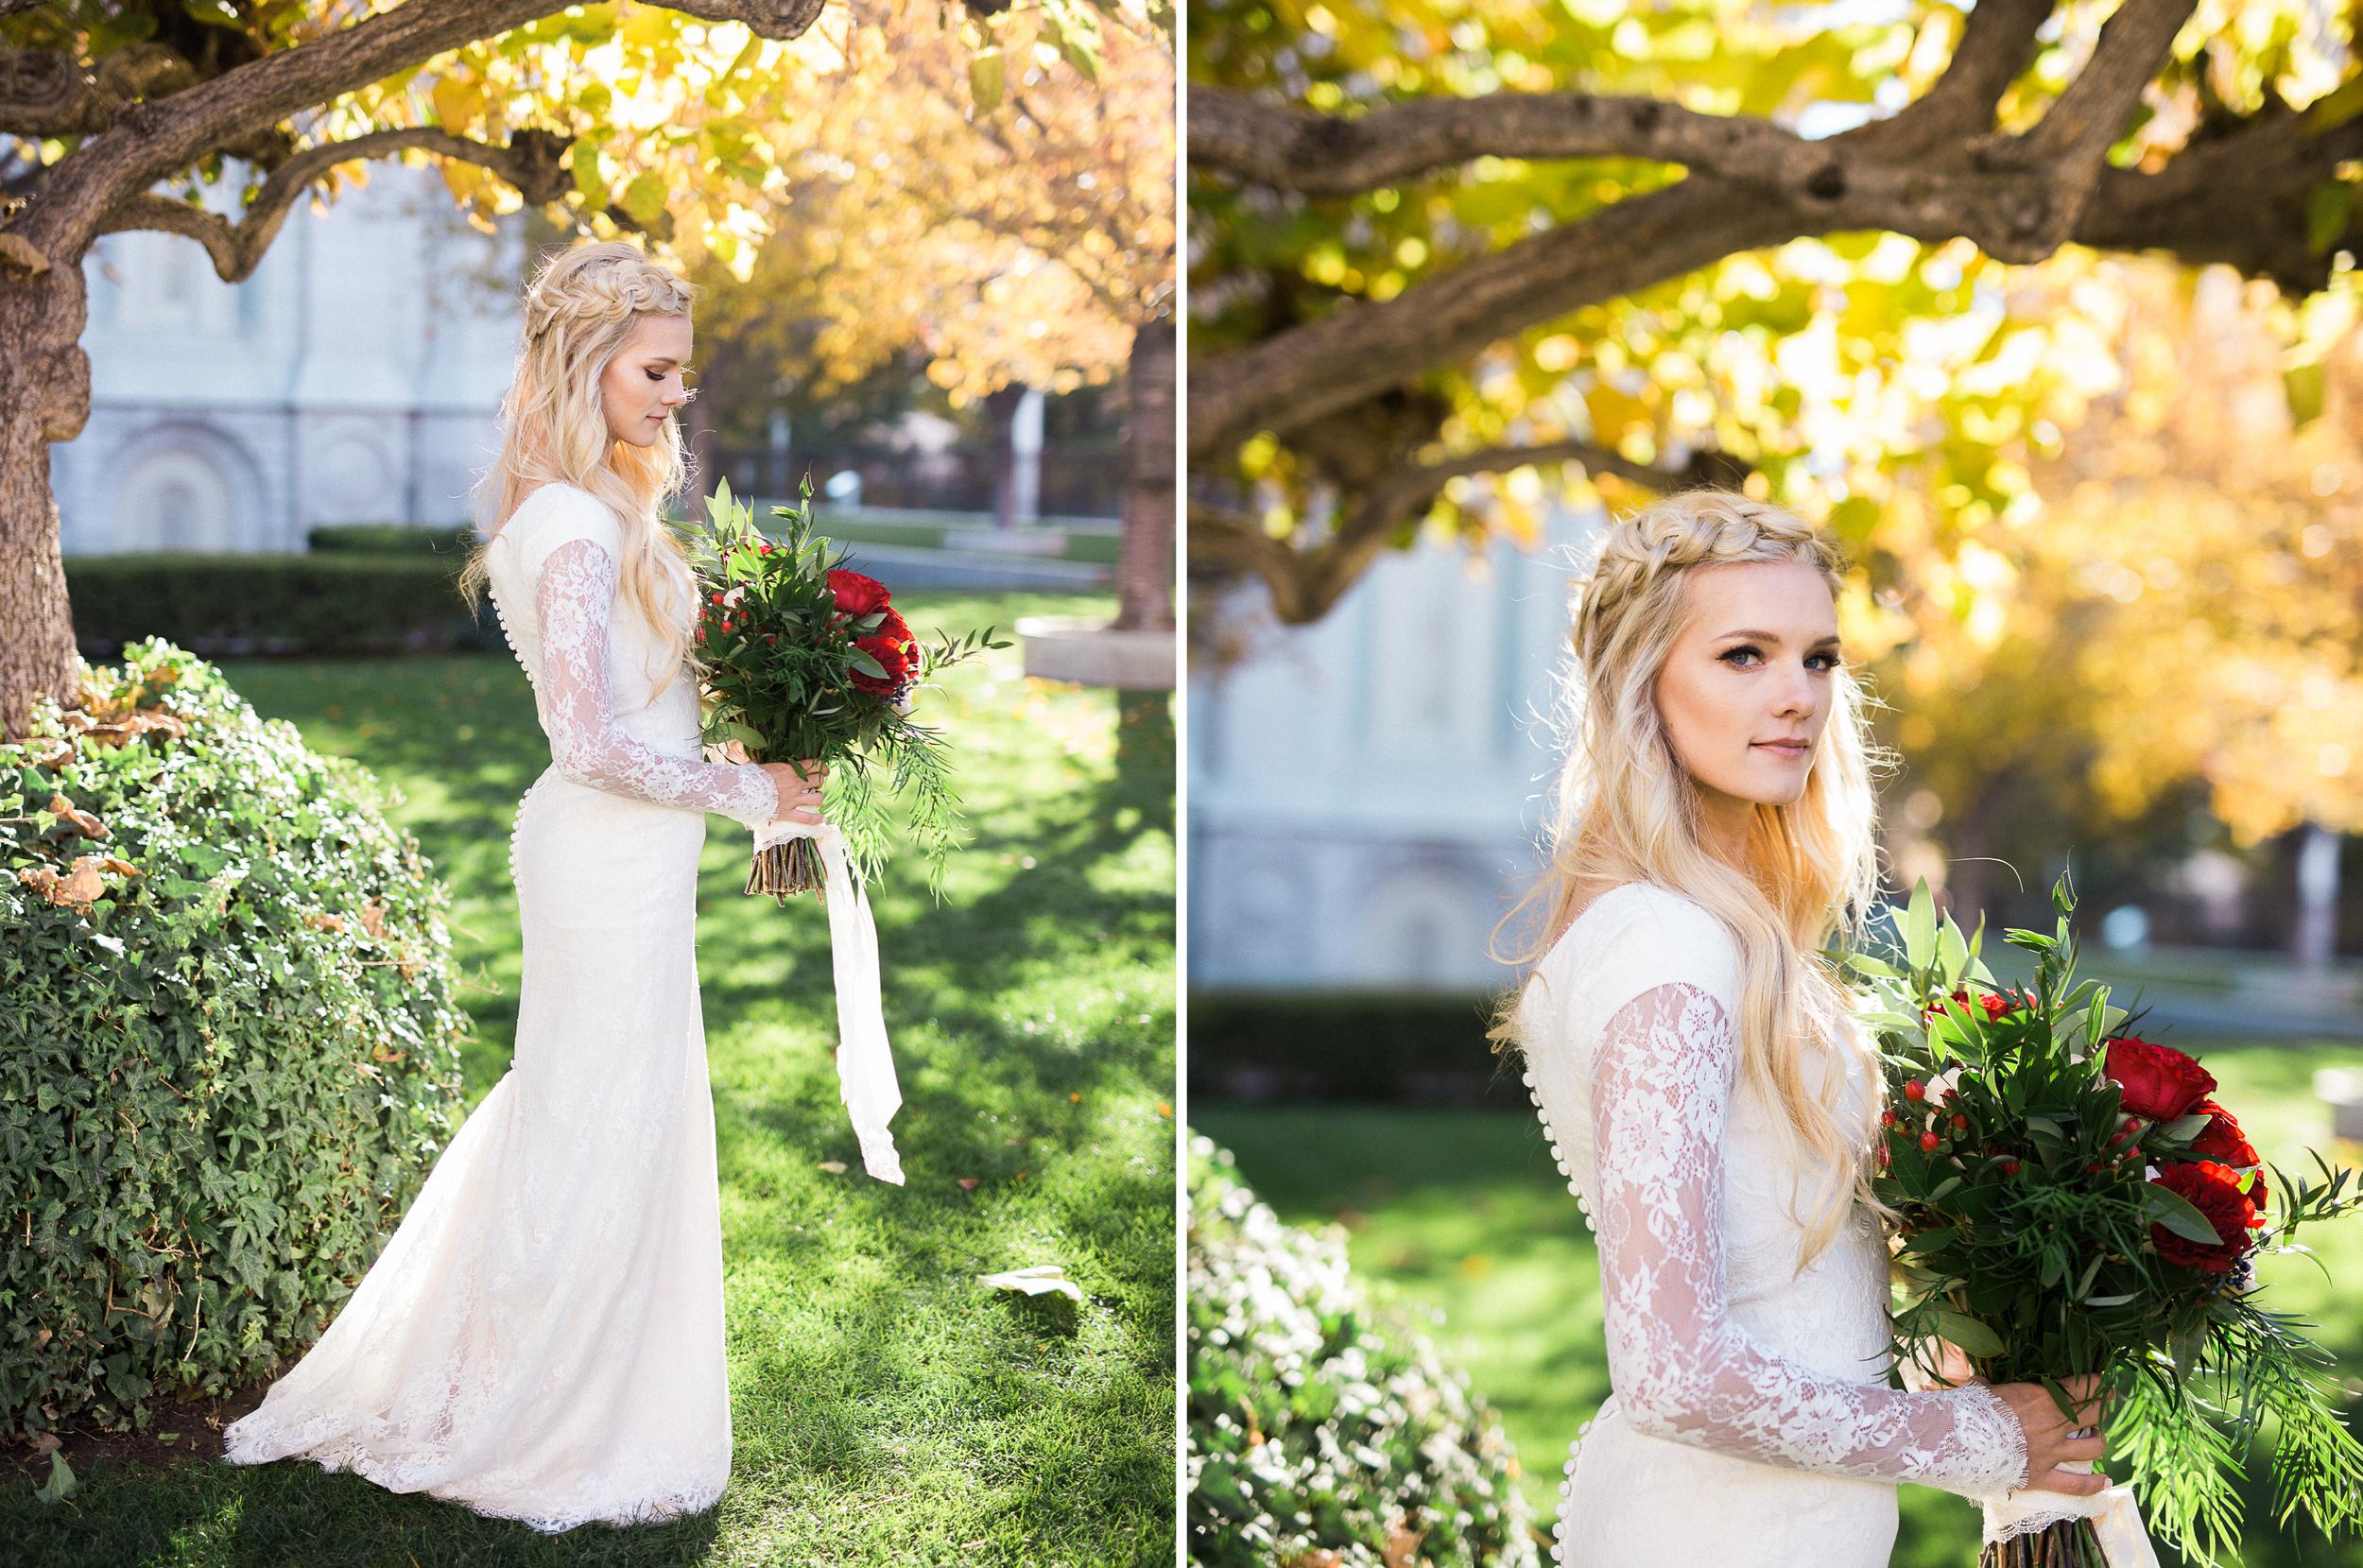 Salt-Lake-City-Temple-Wedding-Photographer-02.jpg